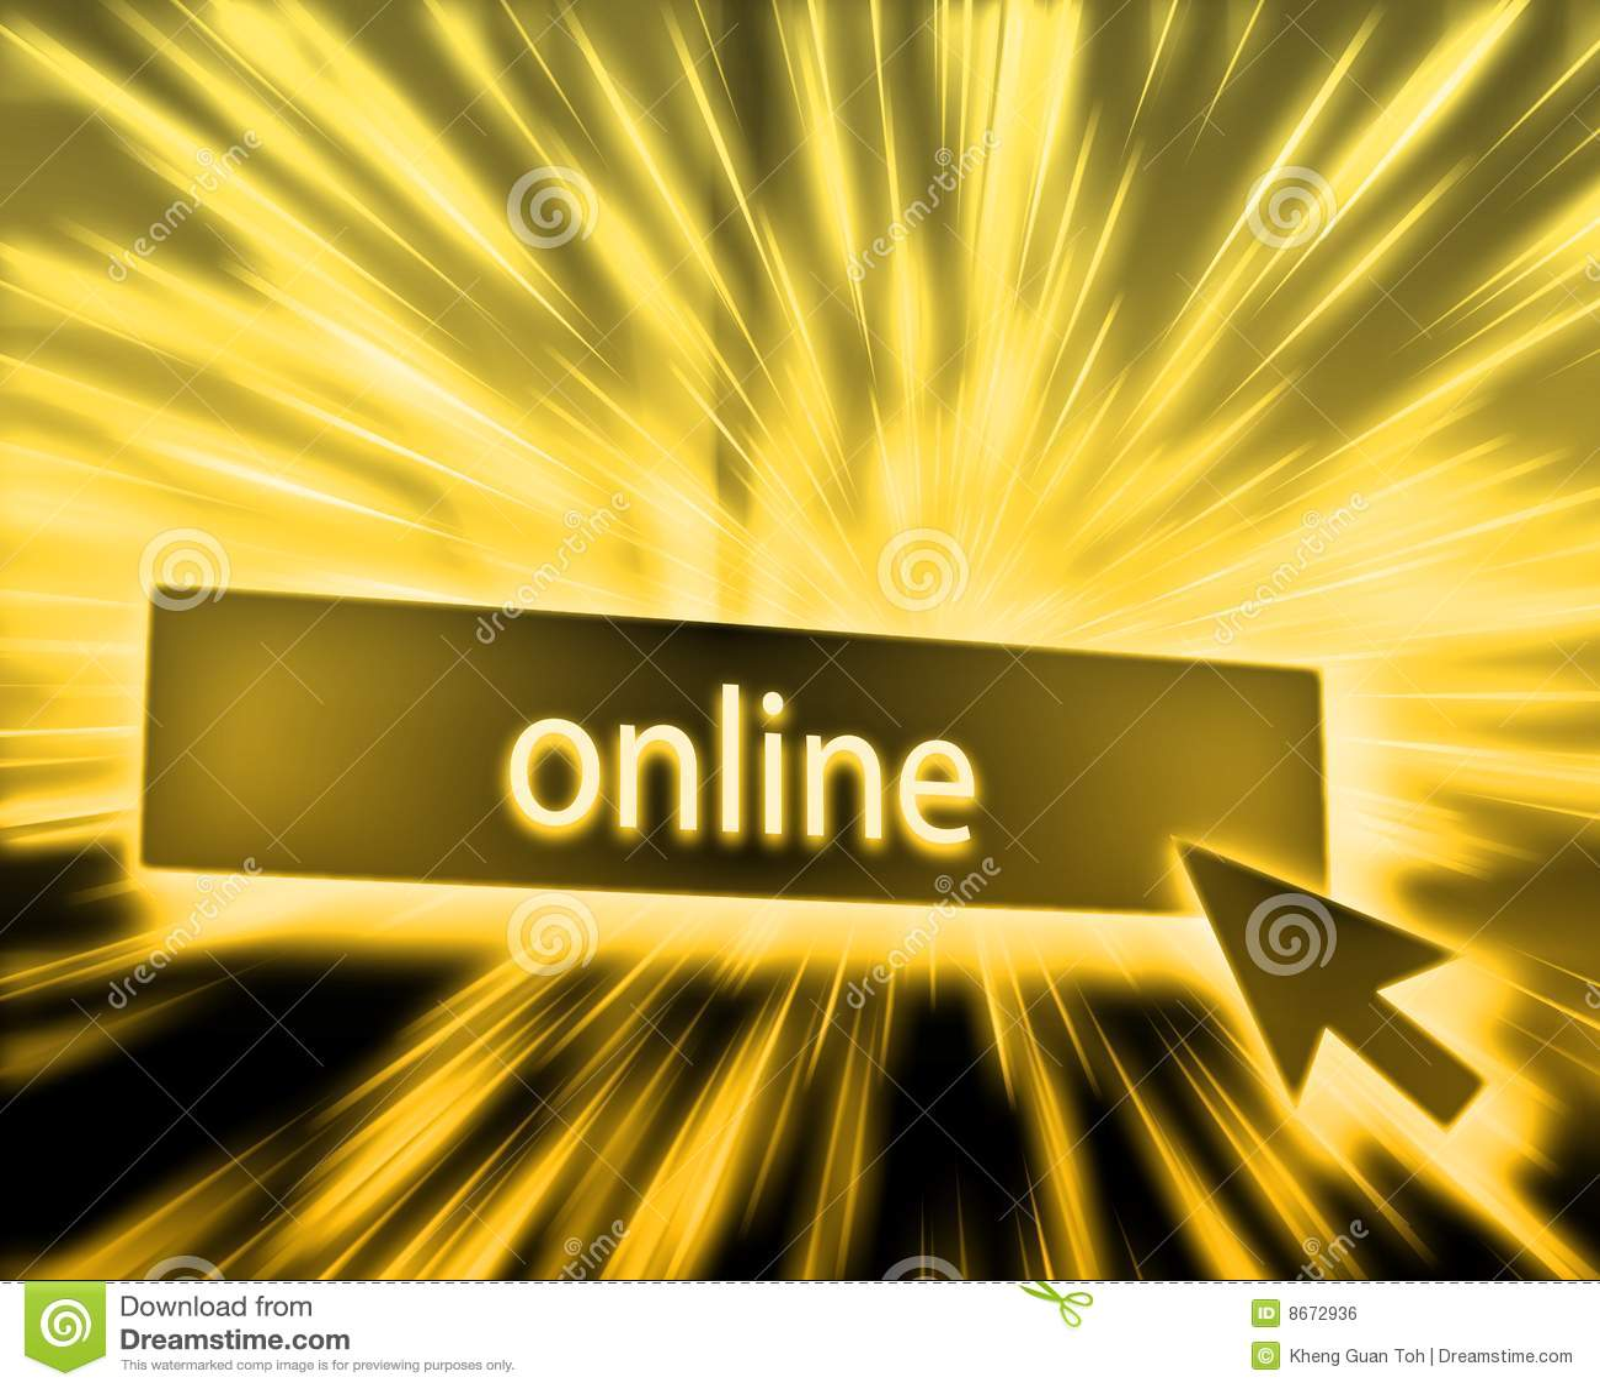 Bouton en ligne